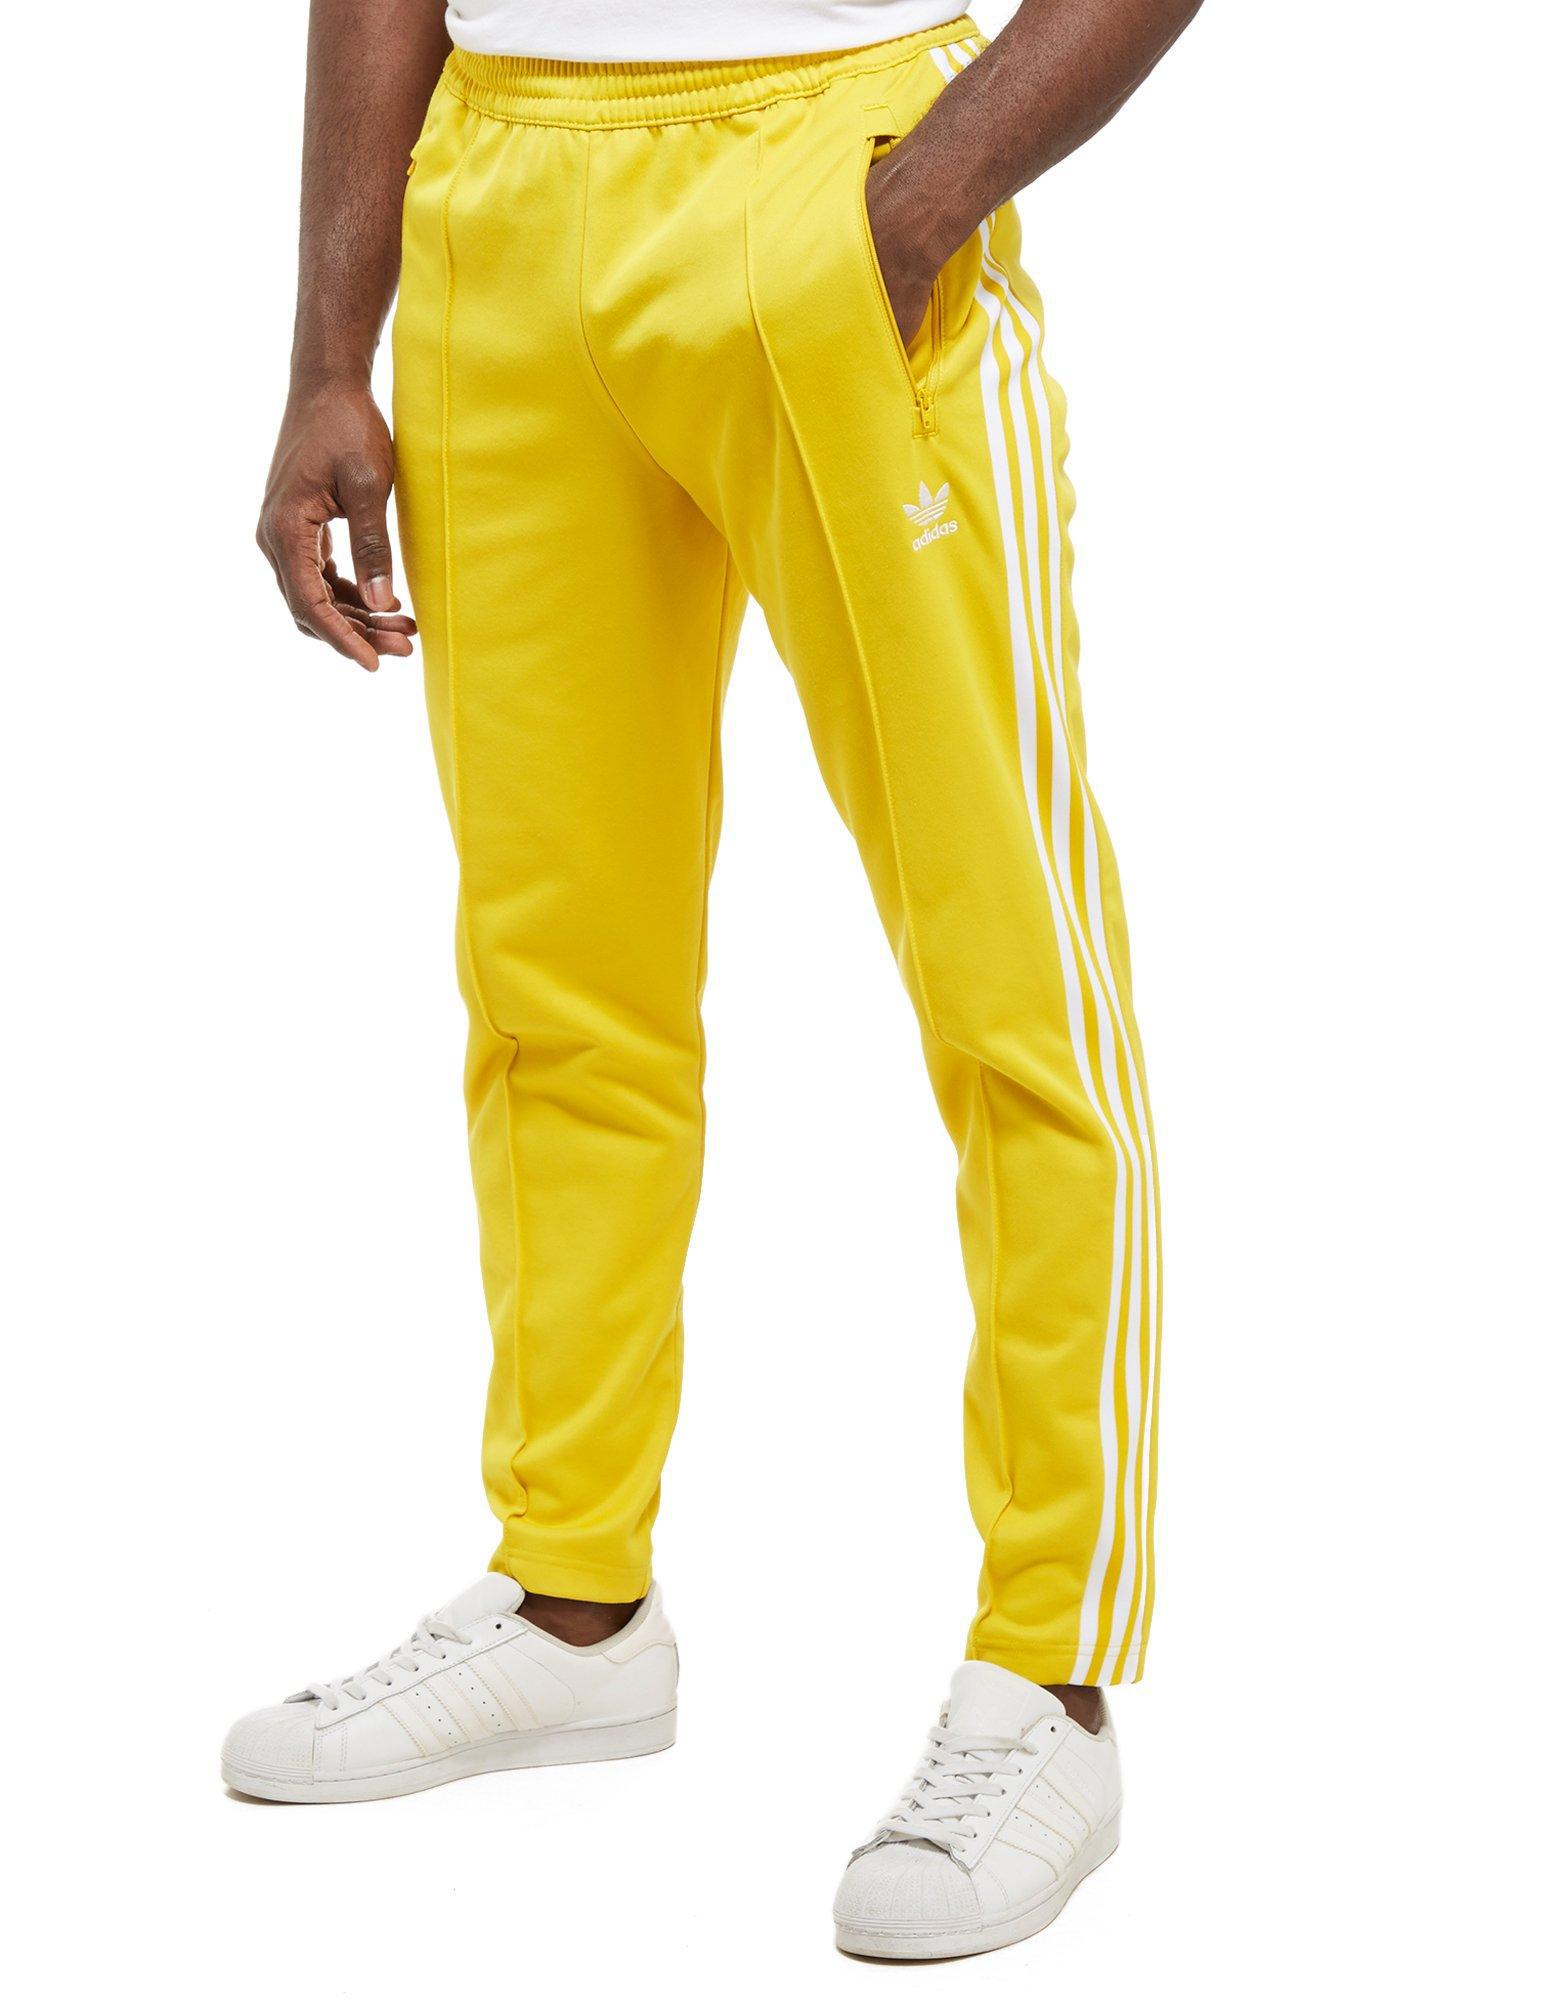 adidas pants discount